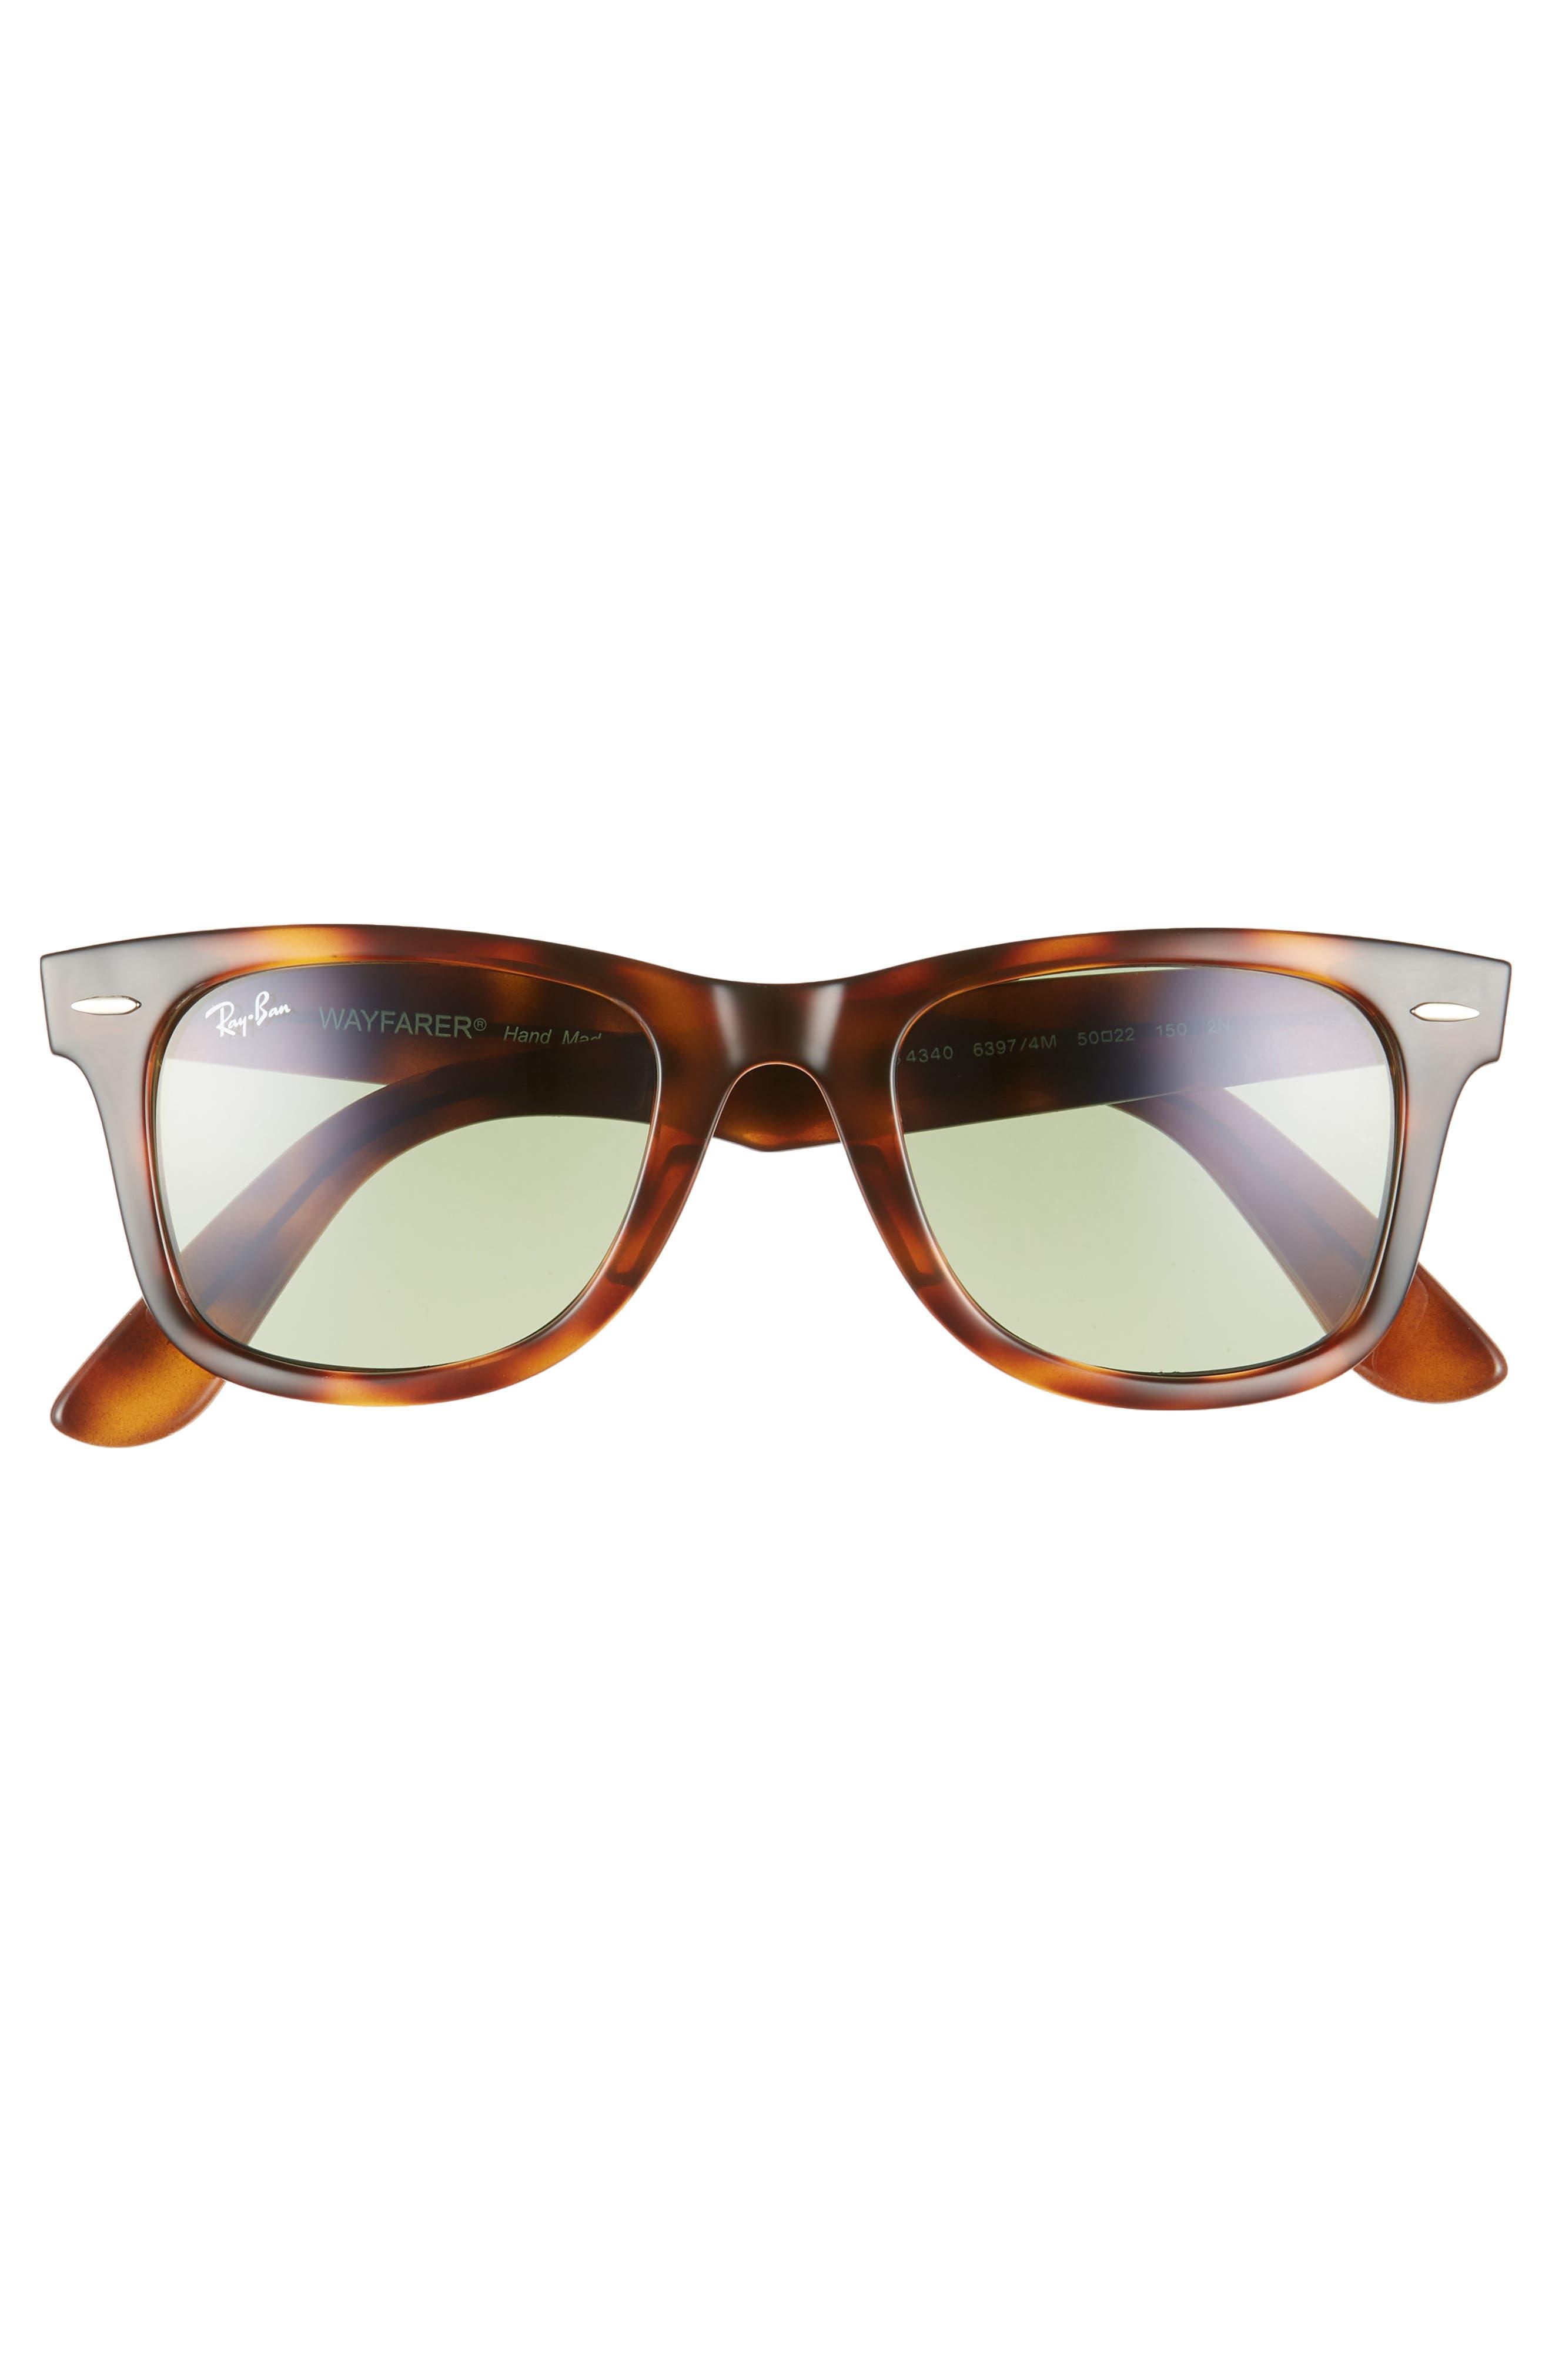 Ray-Ban Sunglasses   Nordstrom b6a6f07d1542